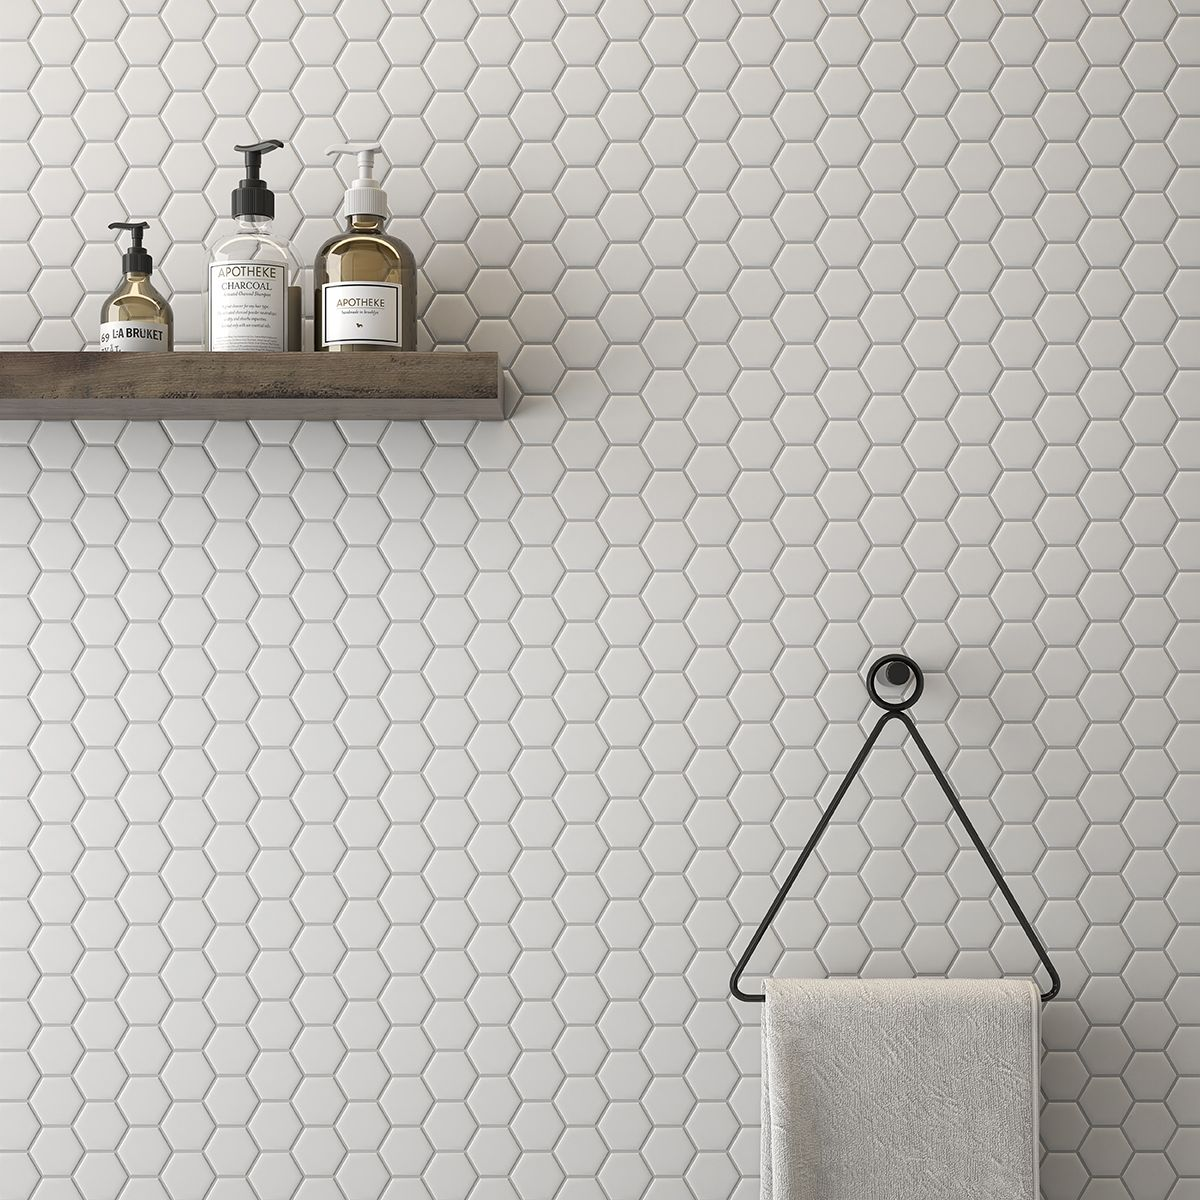 White matte cc mosaics collection ceramic tiles by roca cc white matte cc mosaics collection ceramic tiles by roca dailygadgetfo Images